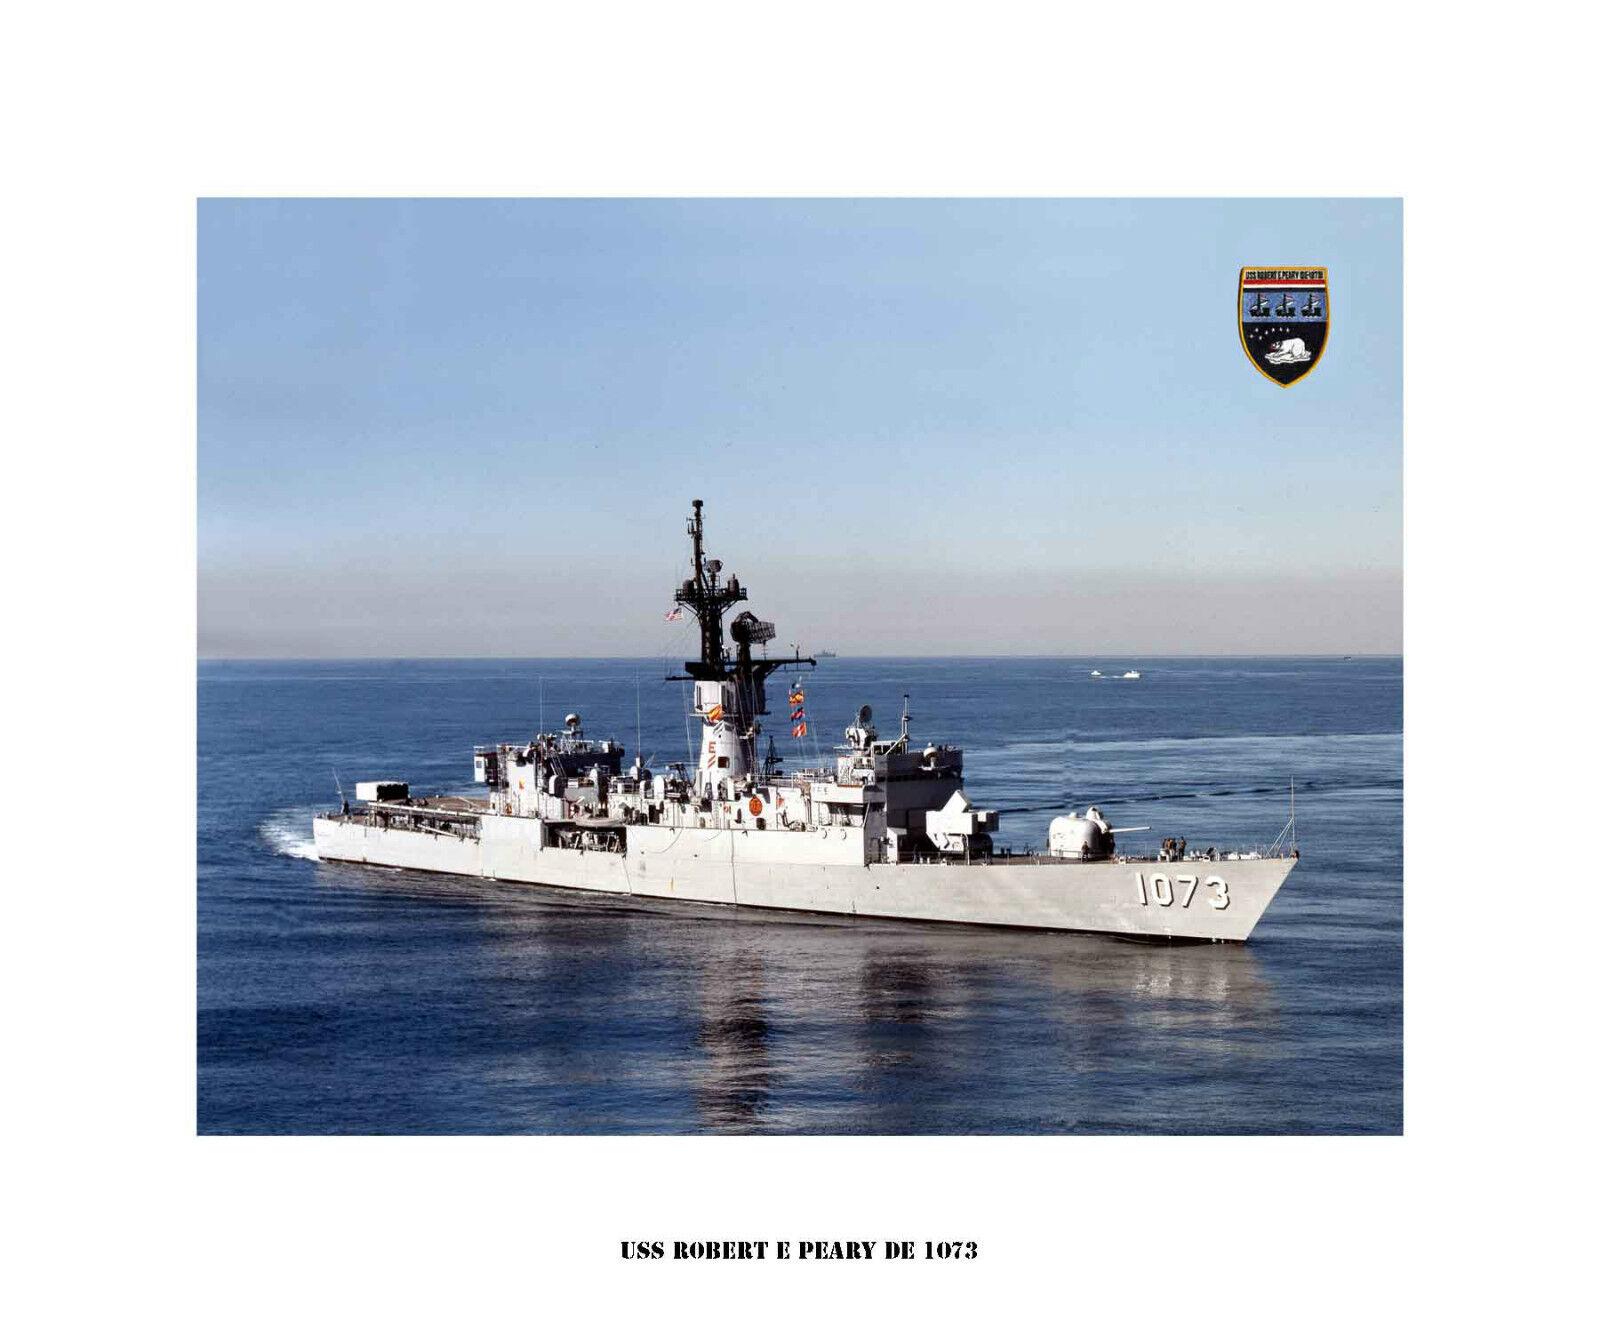 USS ROBERT E PEARY DE 1073,   Destroyer Escort, US Ship, USN Navy Photo Drucken